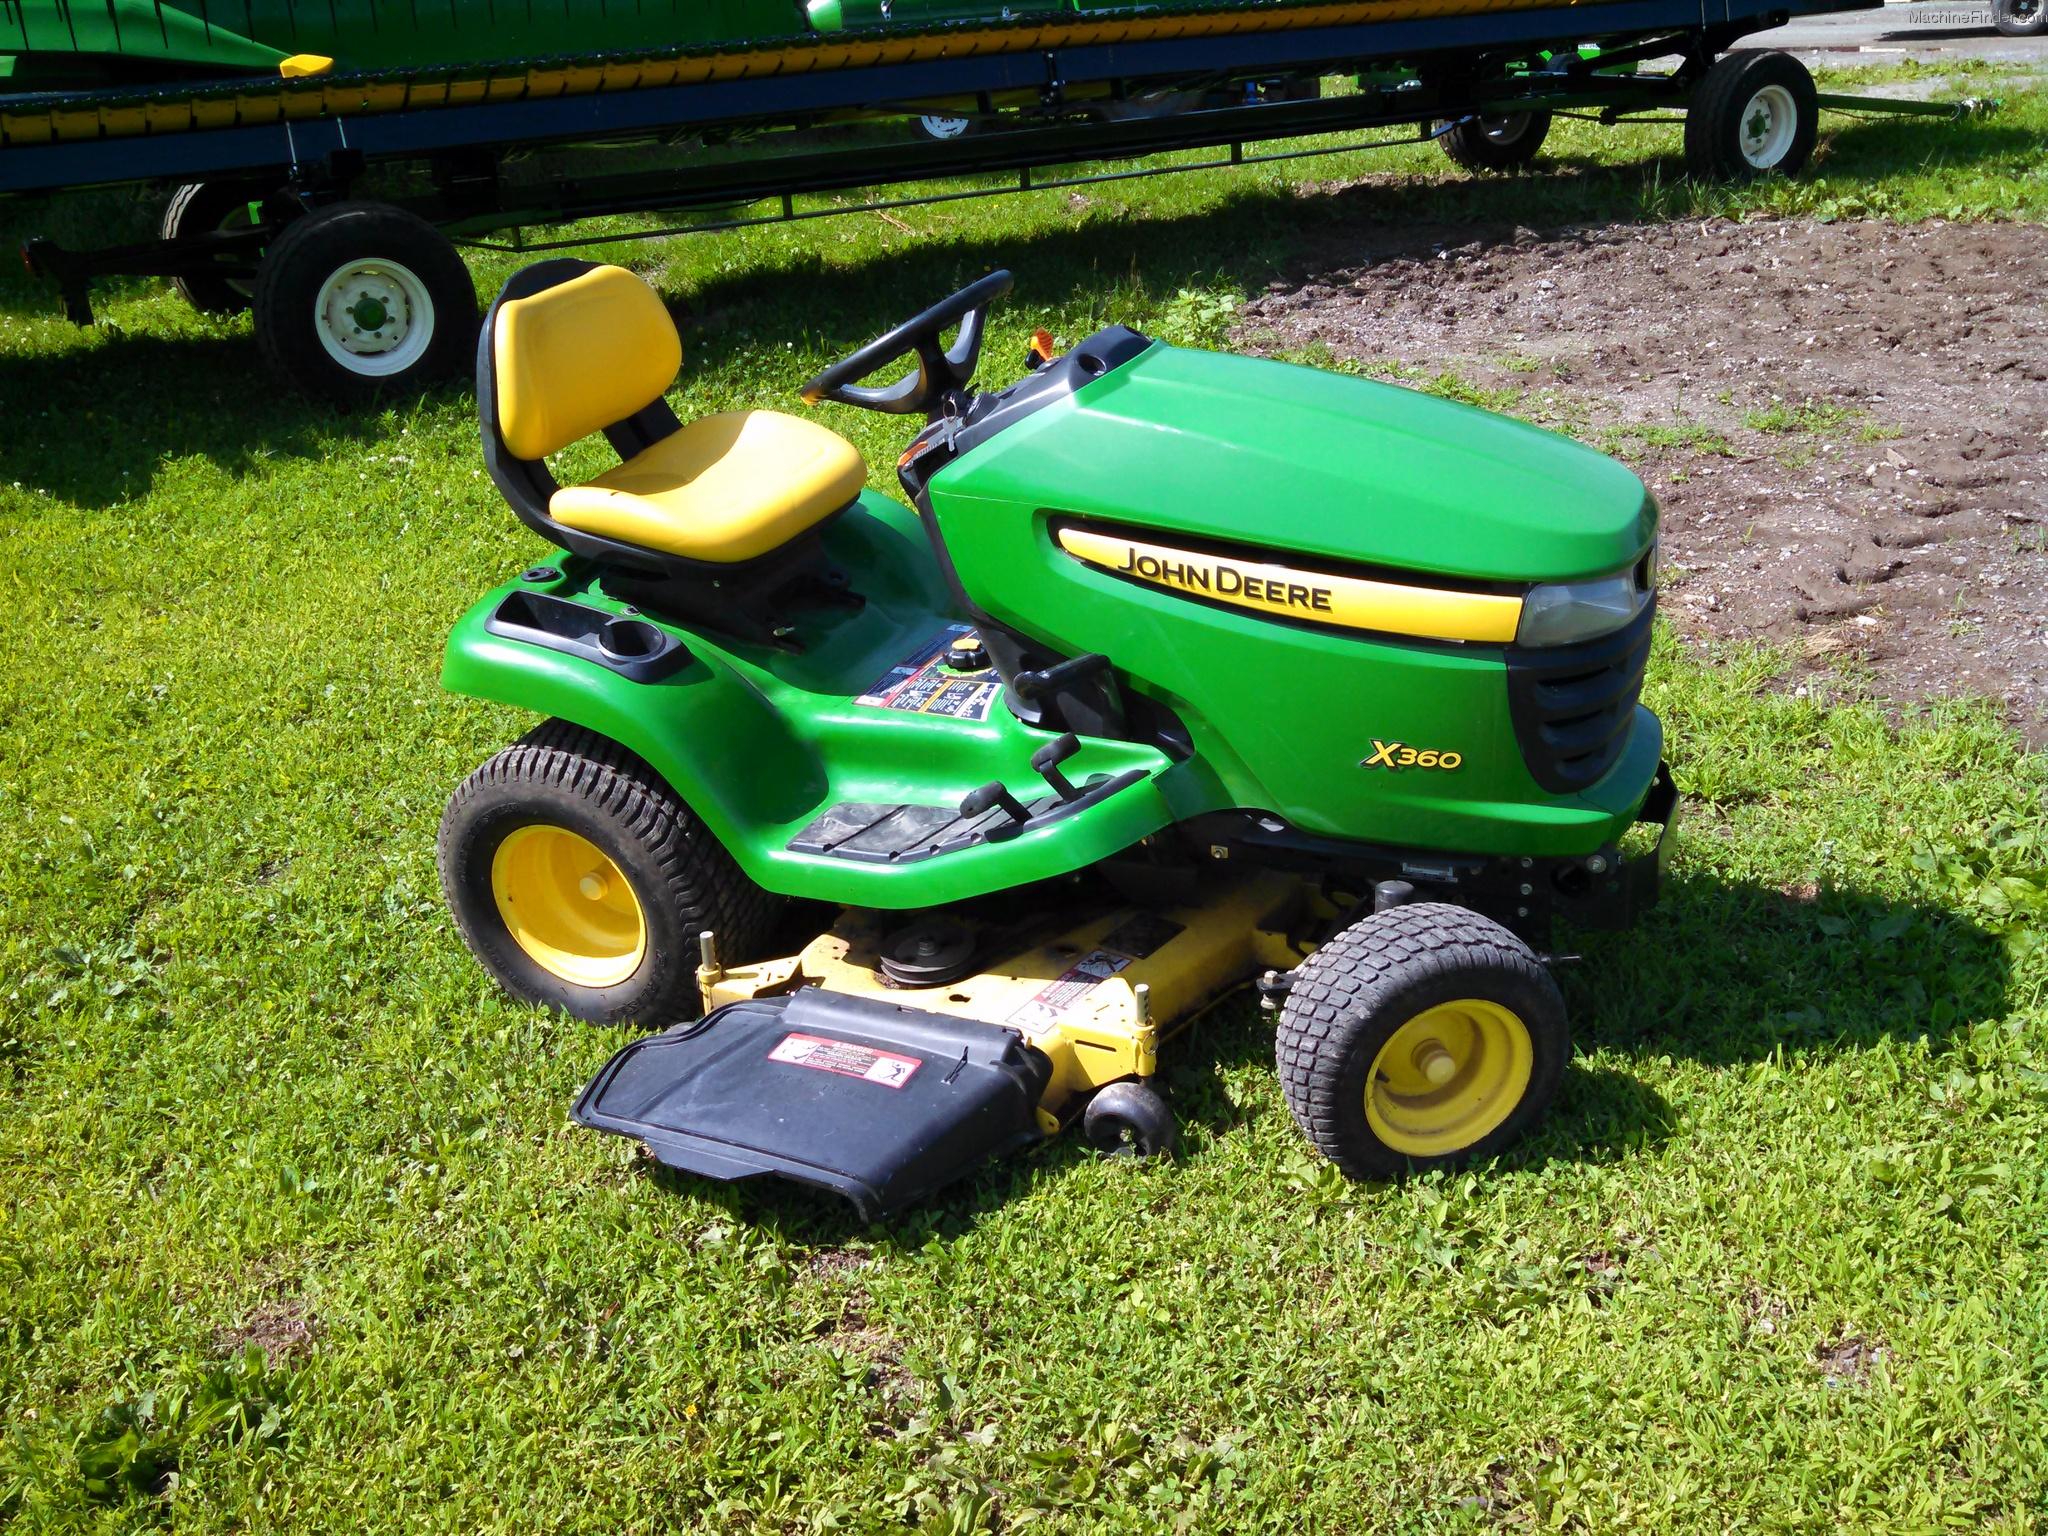 John Deere X360 Lawn & Garden and Commercial Mowing - John ...